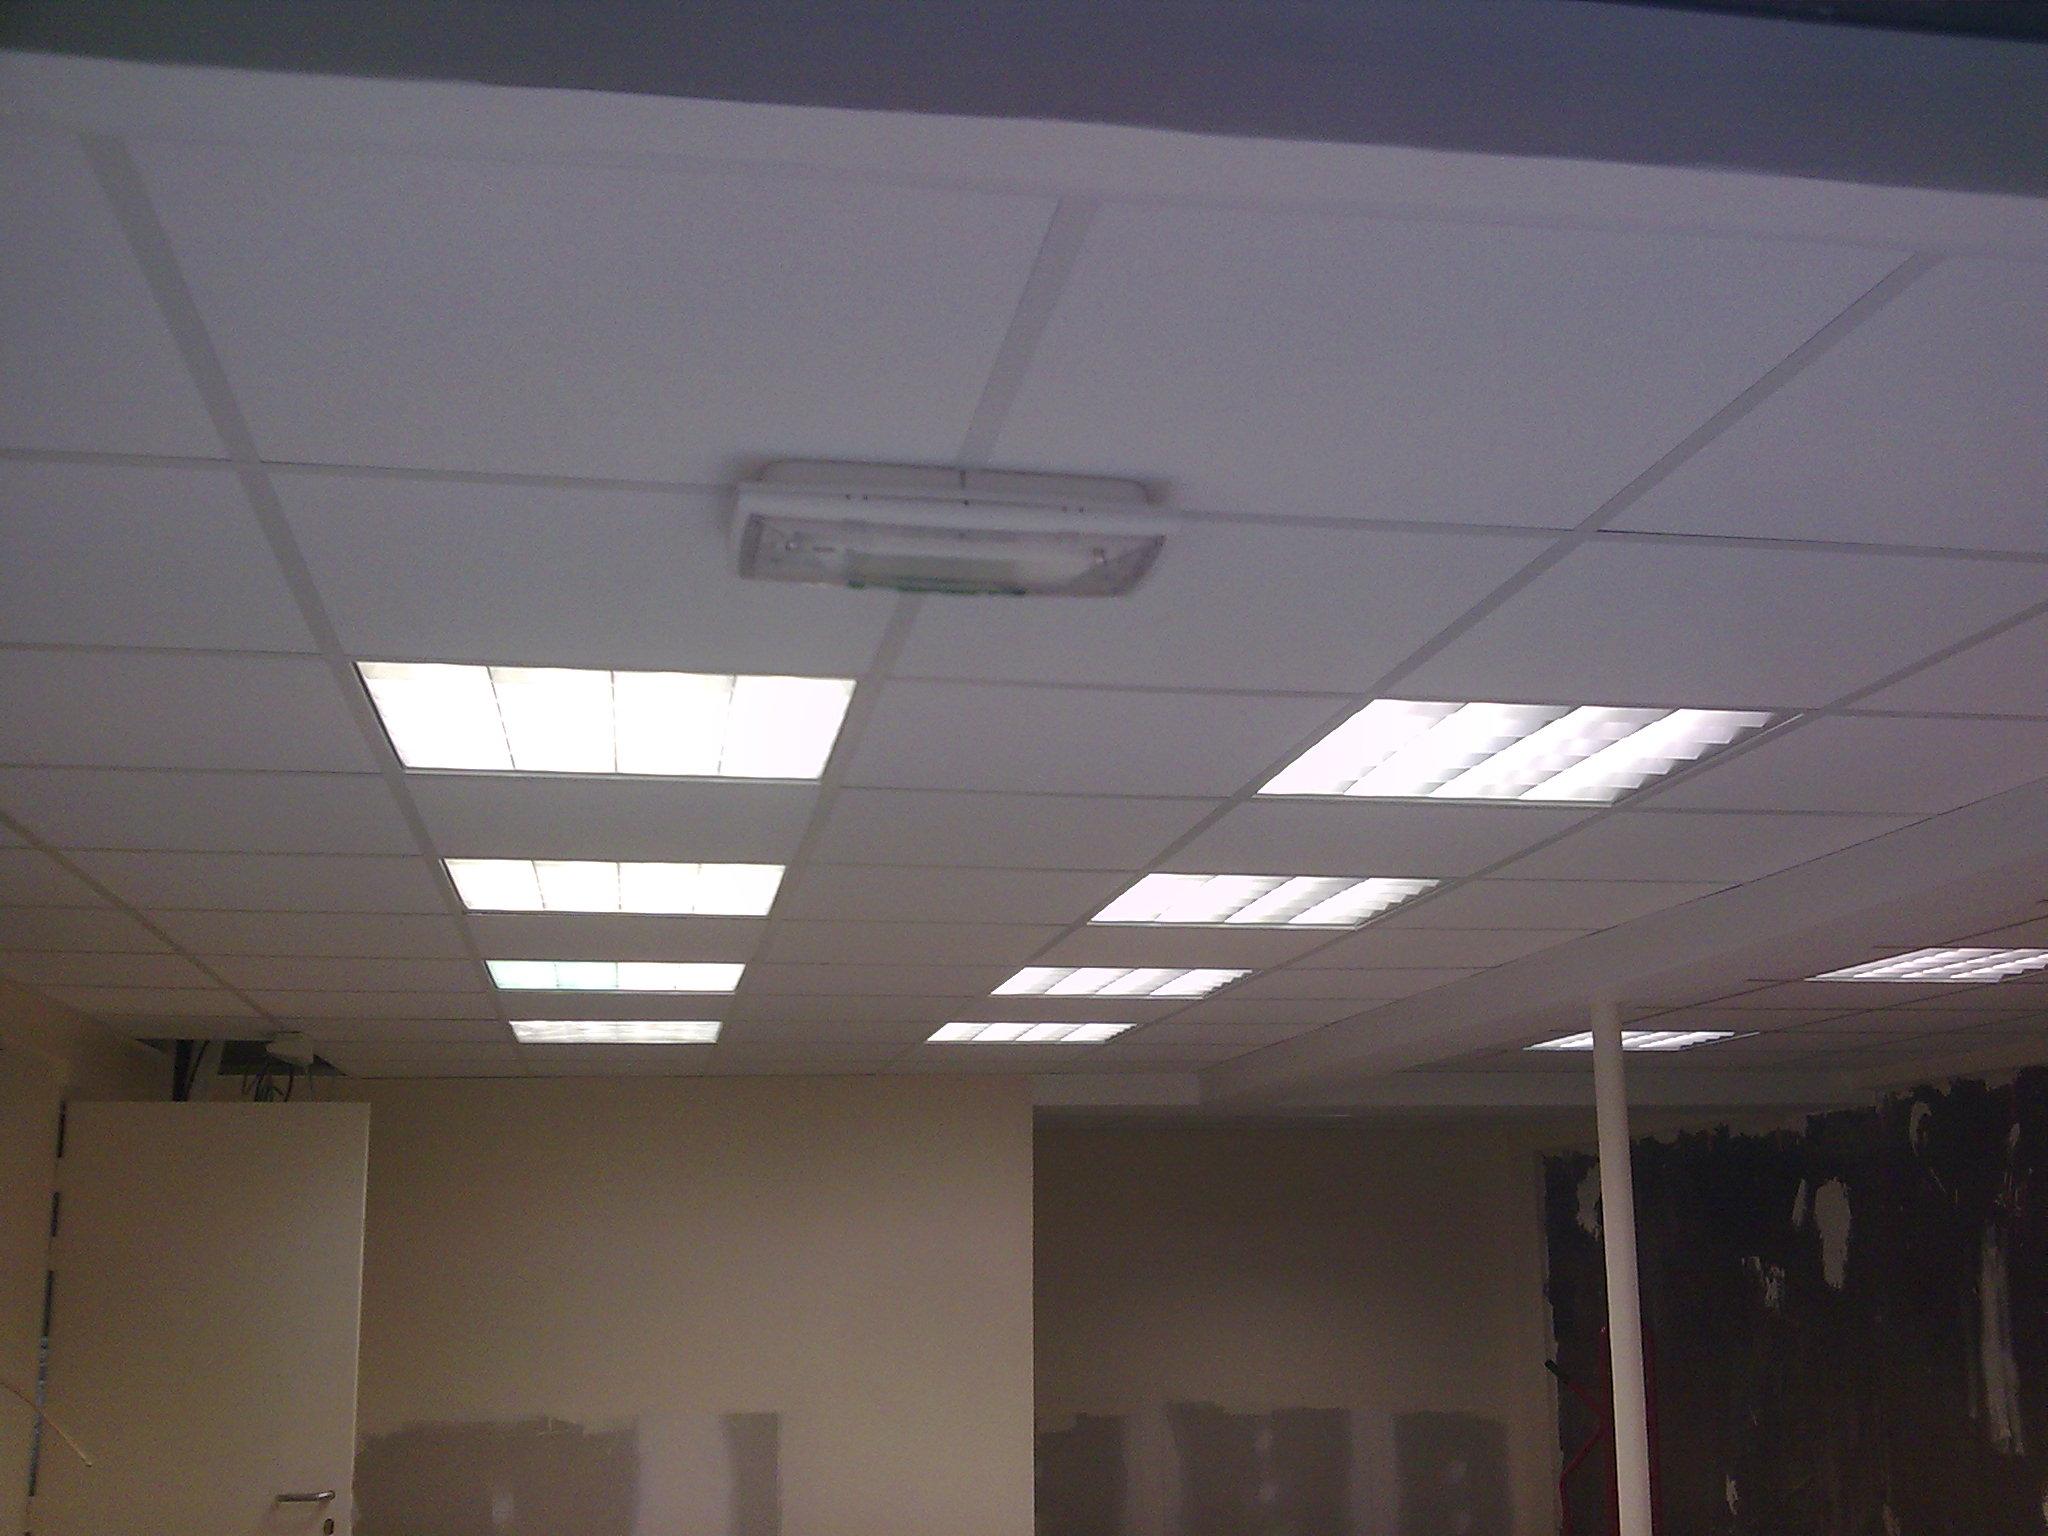 Plafond suspendu en dalles de 60 x 60 Activ Renovation  Epinal